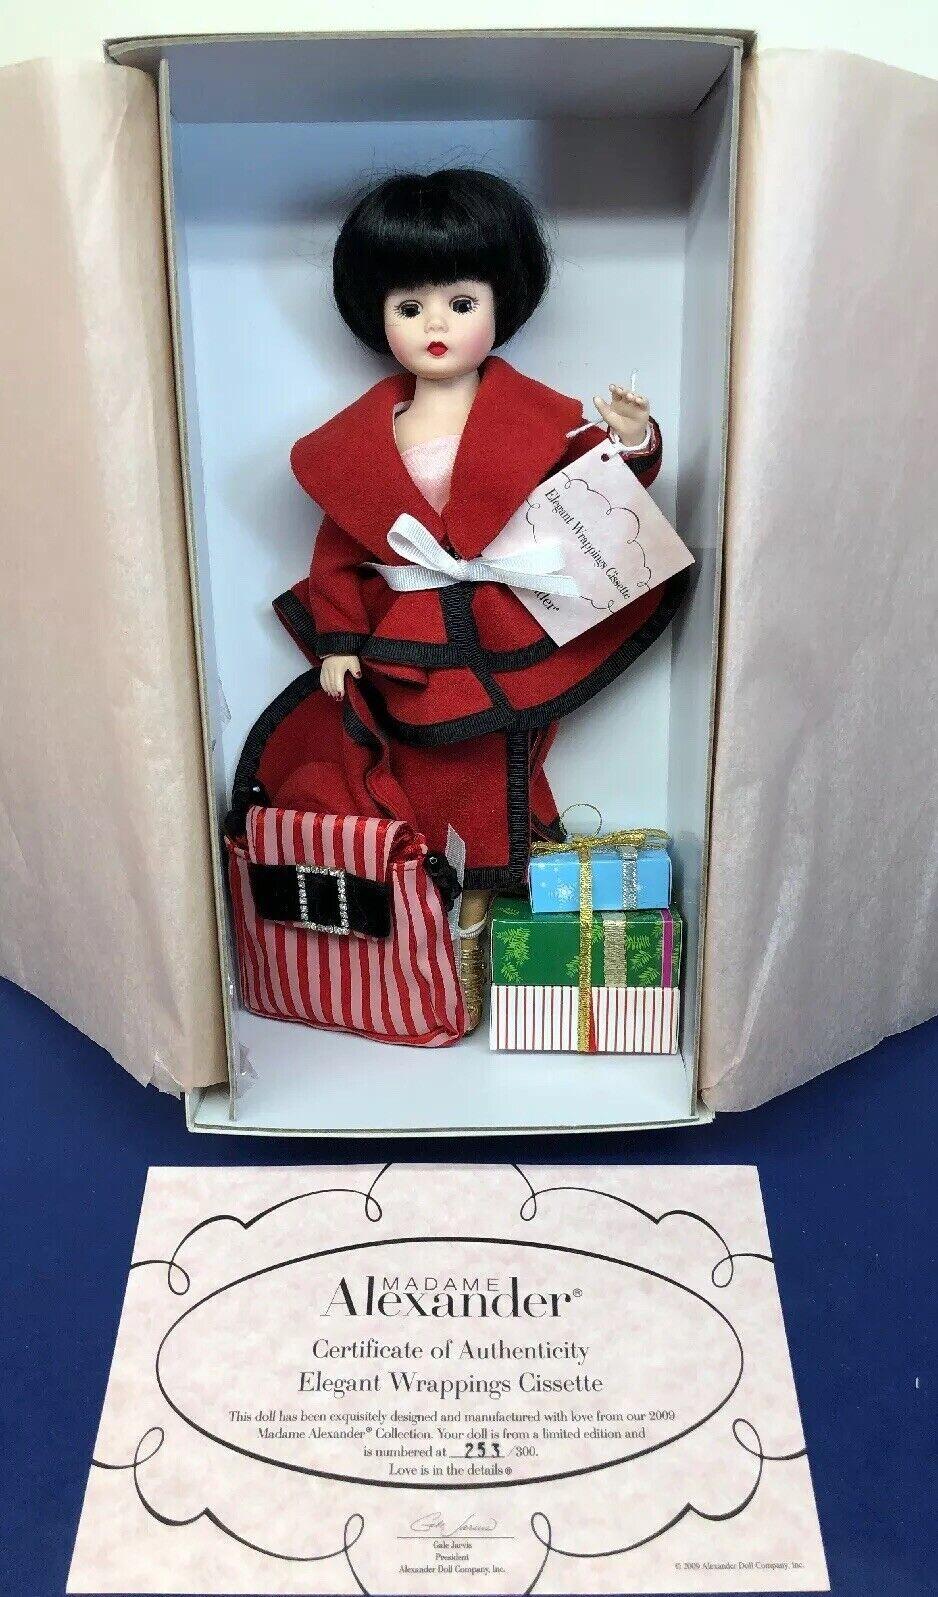 10  Muñeca Madame Alexander  envolturas elegante cissette  253 300 Menta Con Caja